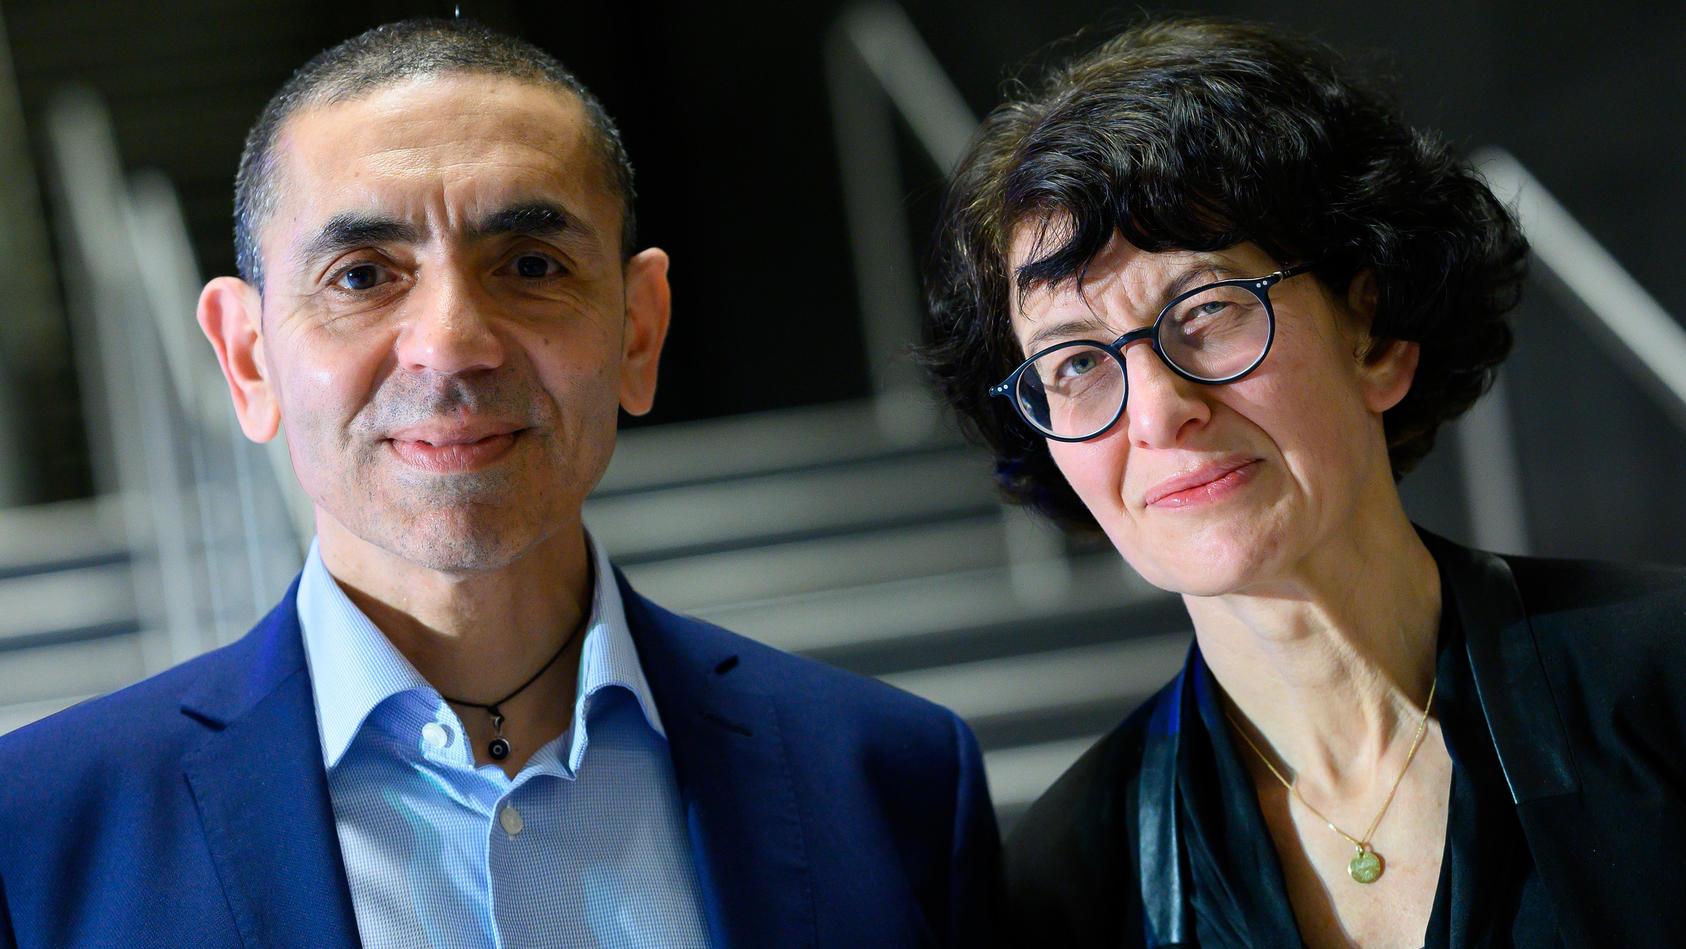 Ugur Sahin und Özlem Türeci haben Biontech gegründet.